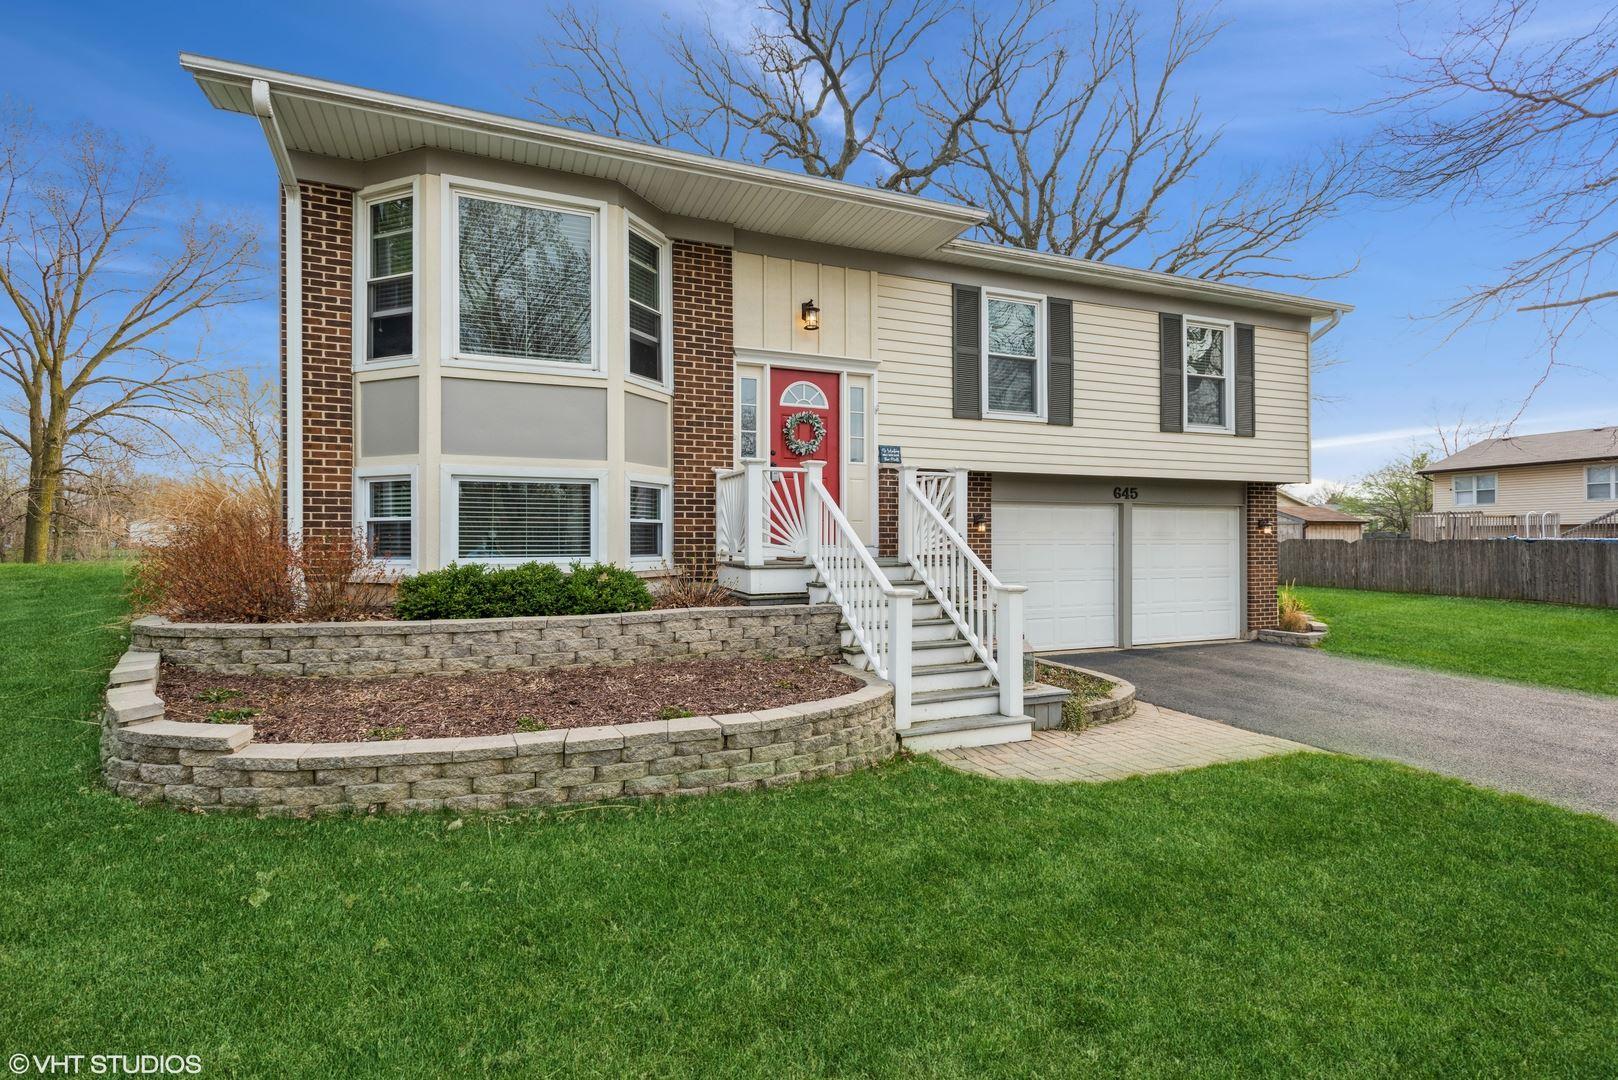 Photo of 645 Banbury Way, Bolingbrook, IL 60440 (MLS # 11044766)